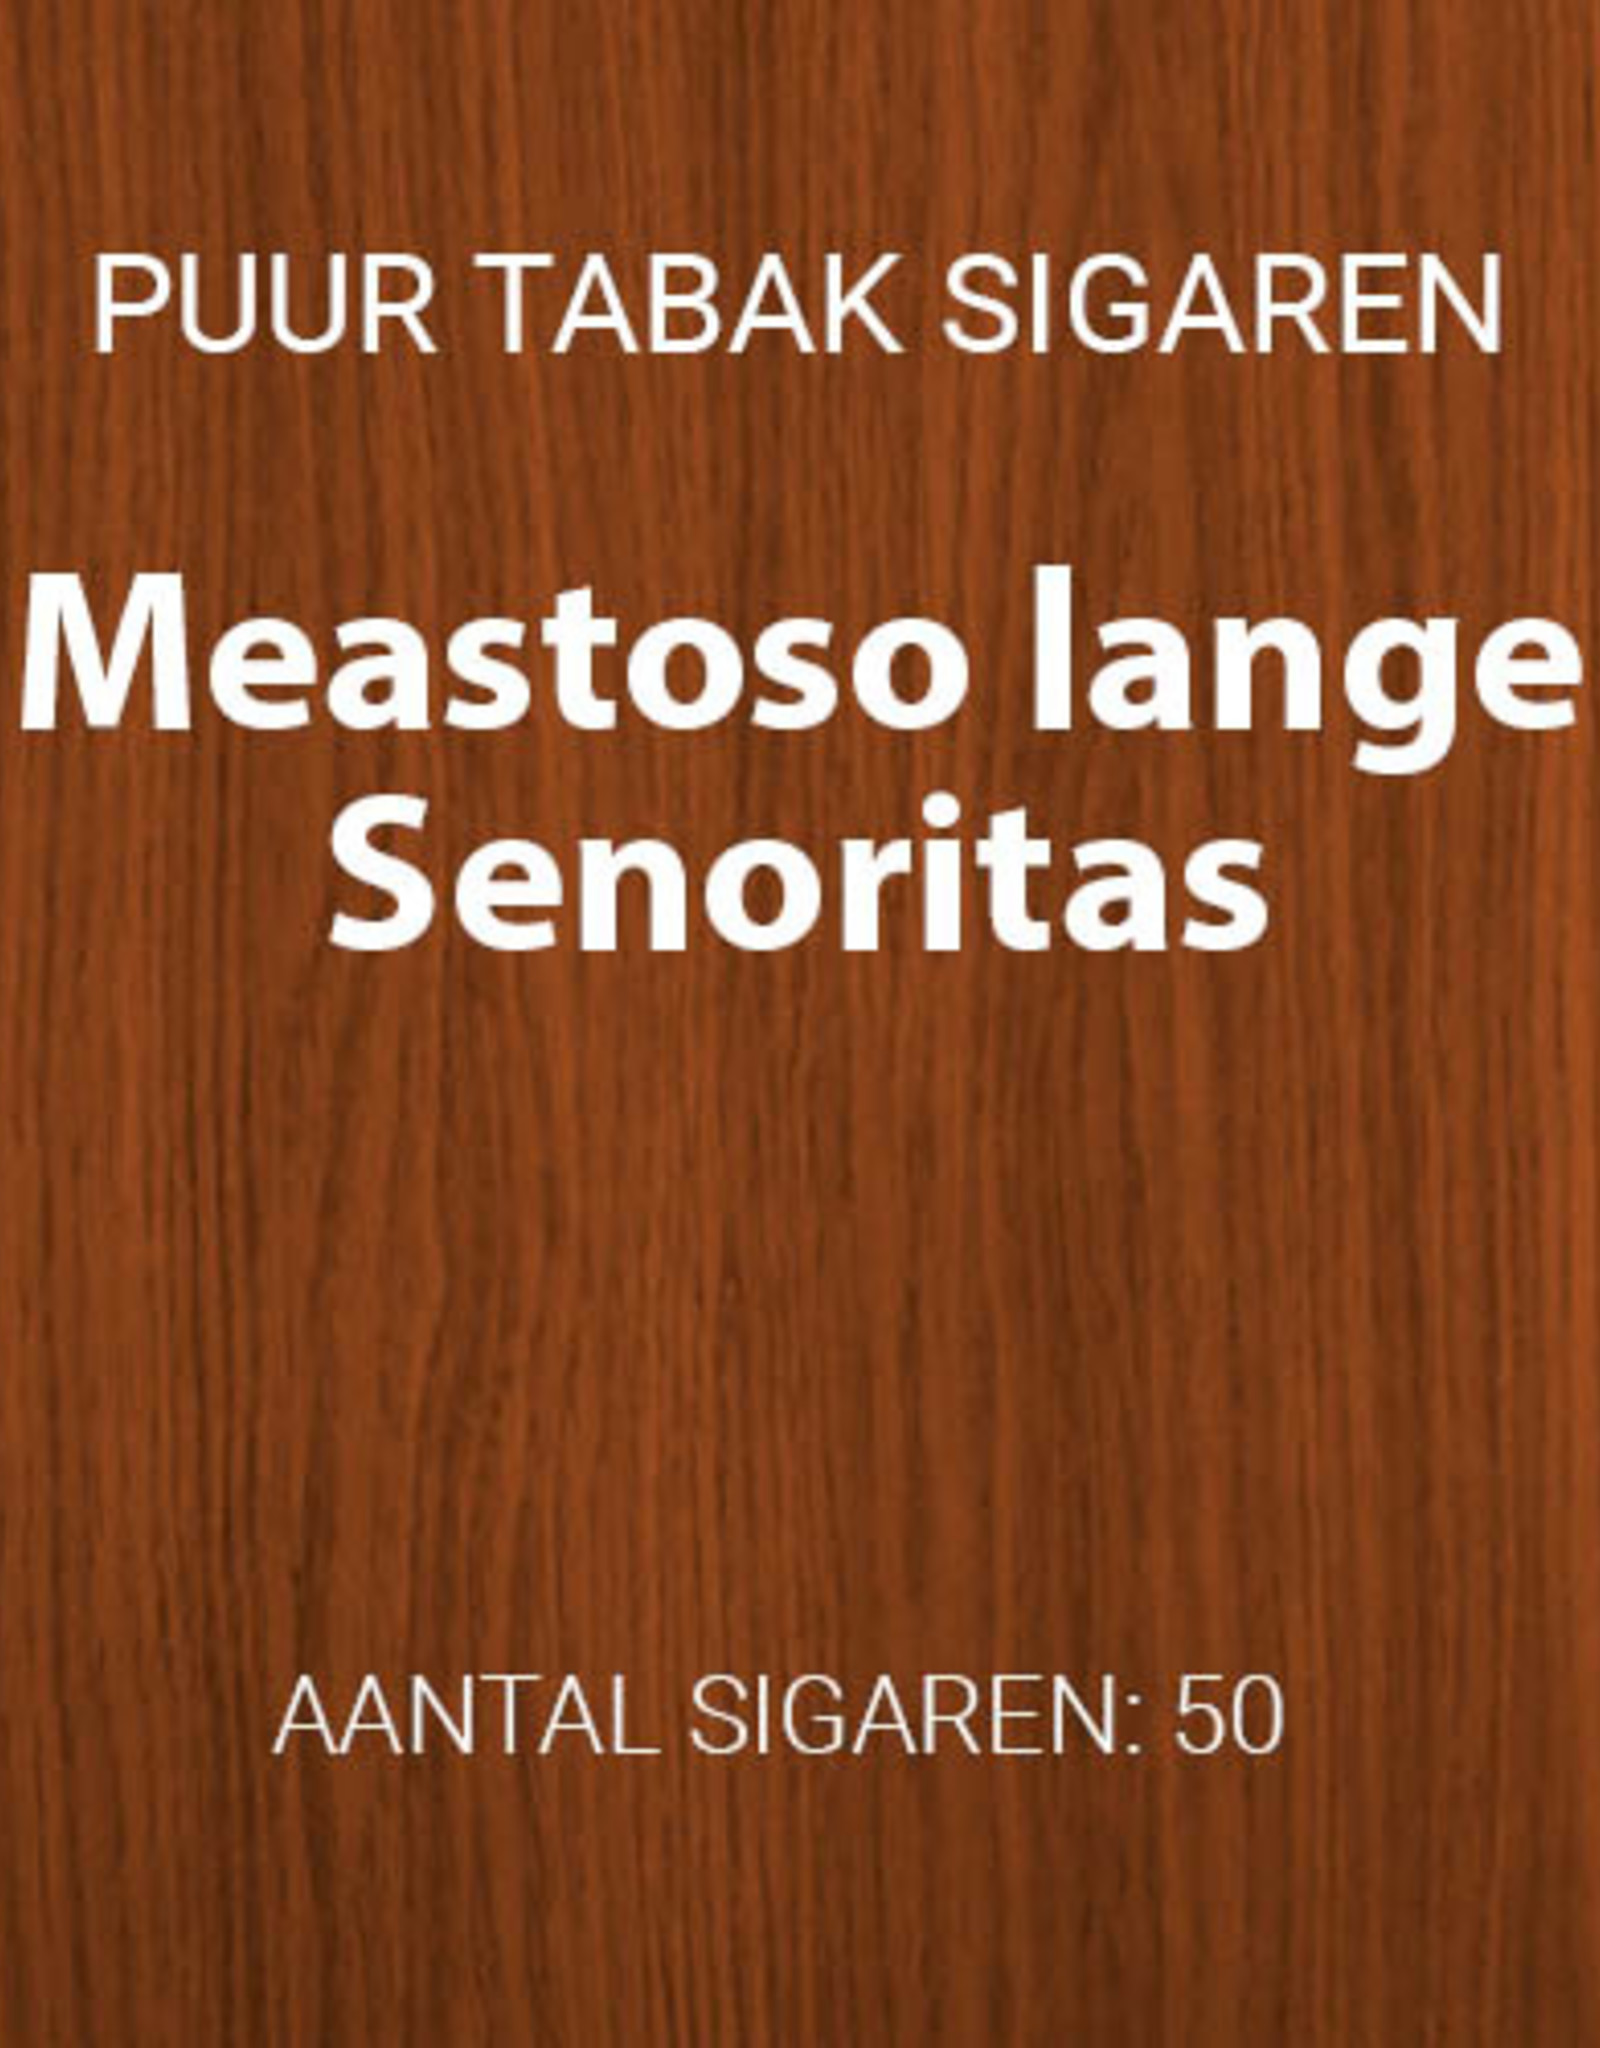 Gouden serie Meastoso lange senoritas